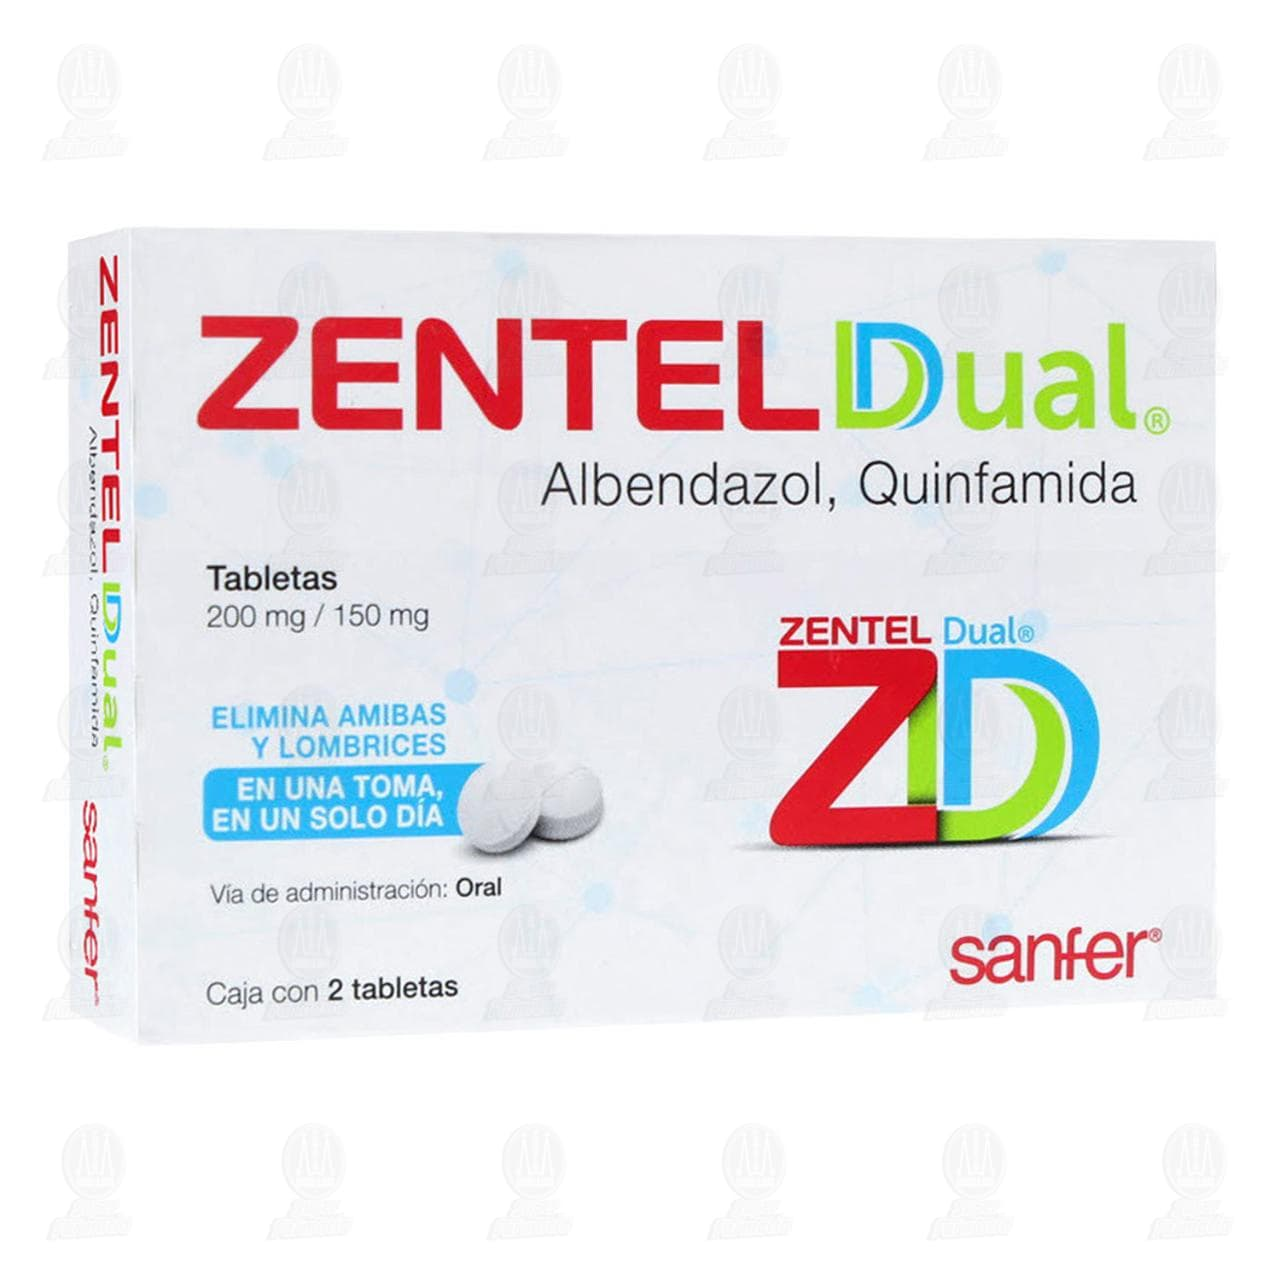 Zentel Dual 200/150mg 2 Tabletas